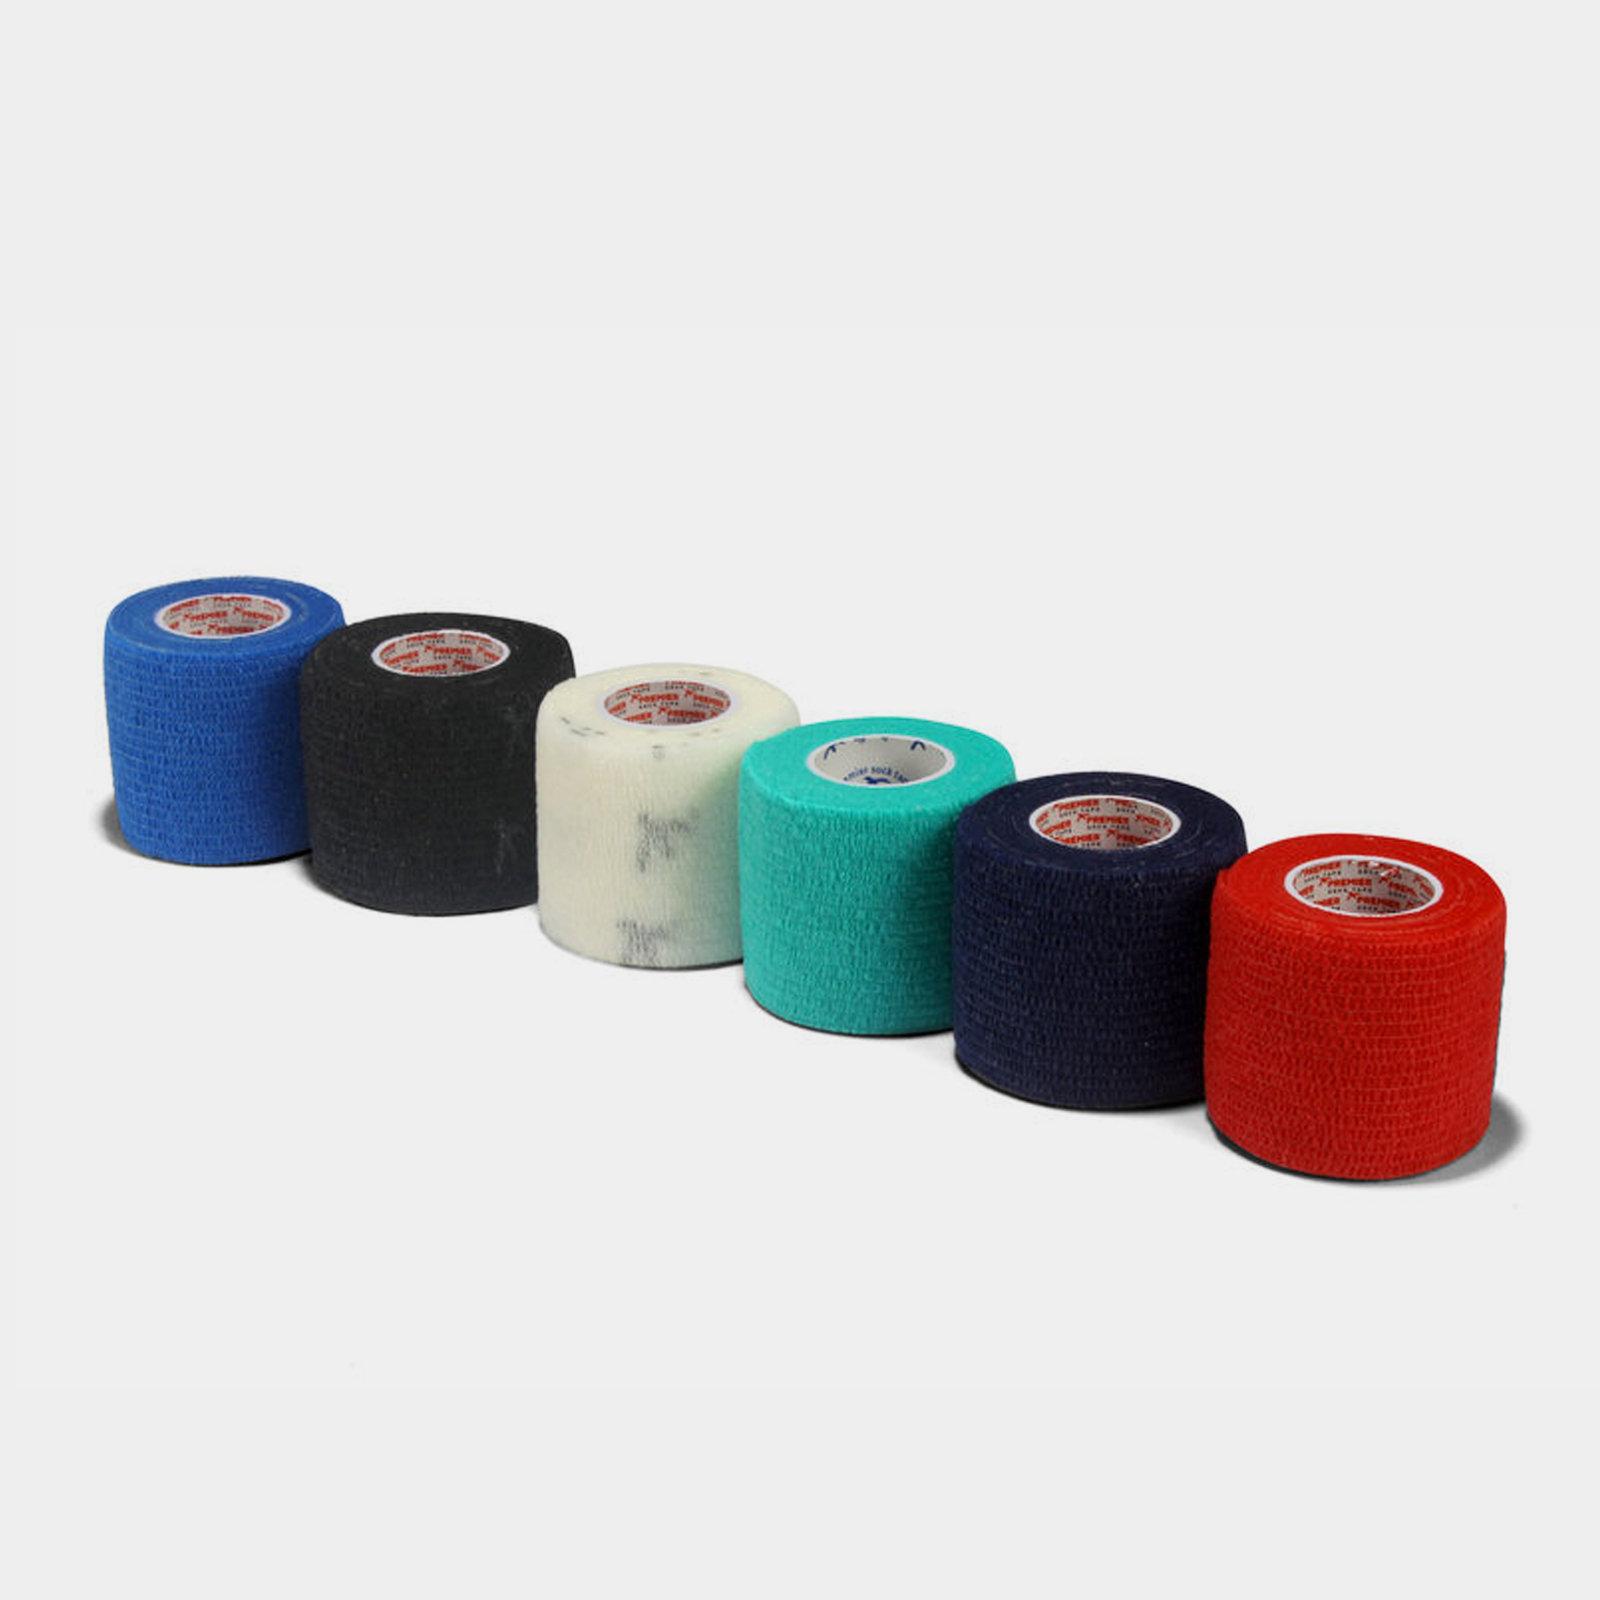 Tape Premier Sock Tape Pro Wrap 5cm x 4,5m